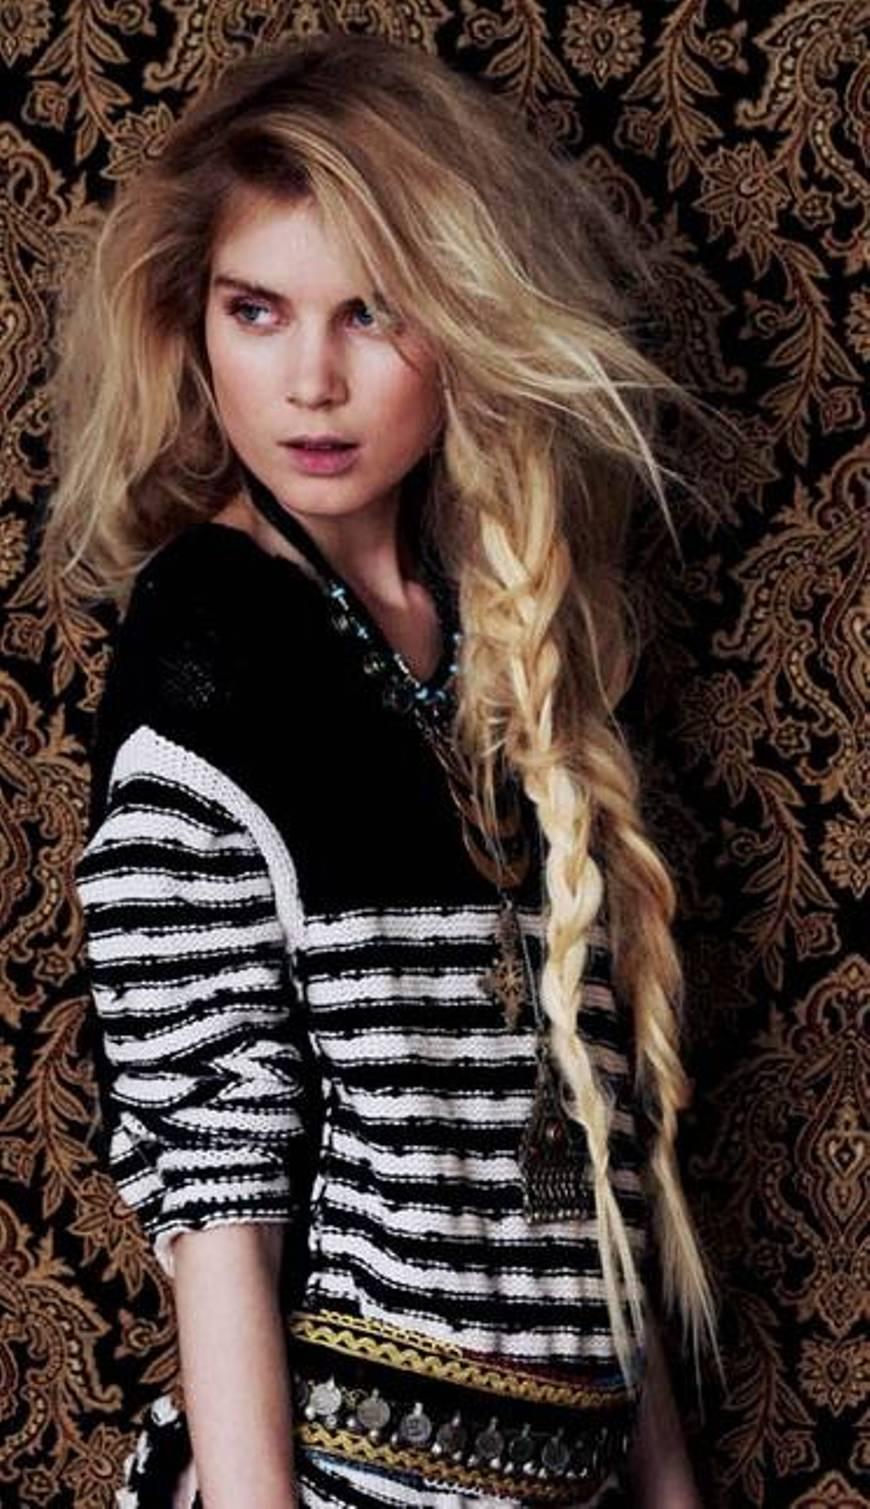 braid-bohemian-hairstyles.jpg